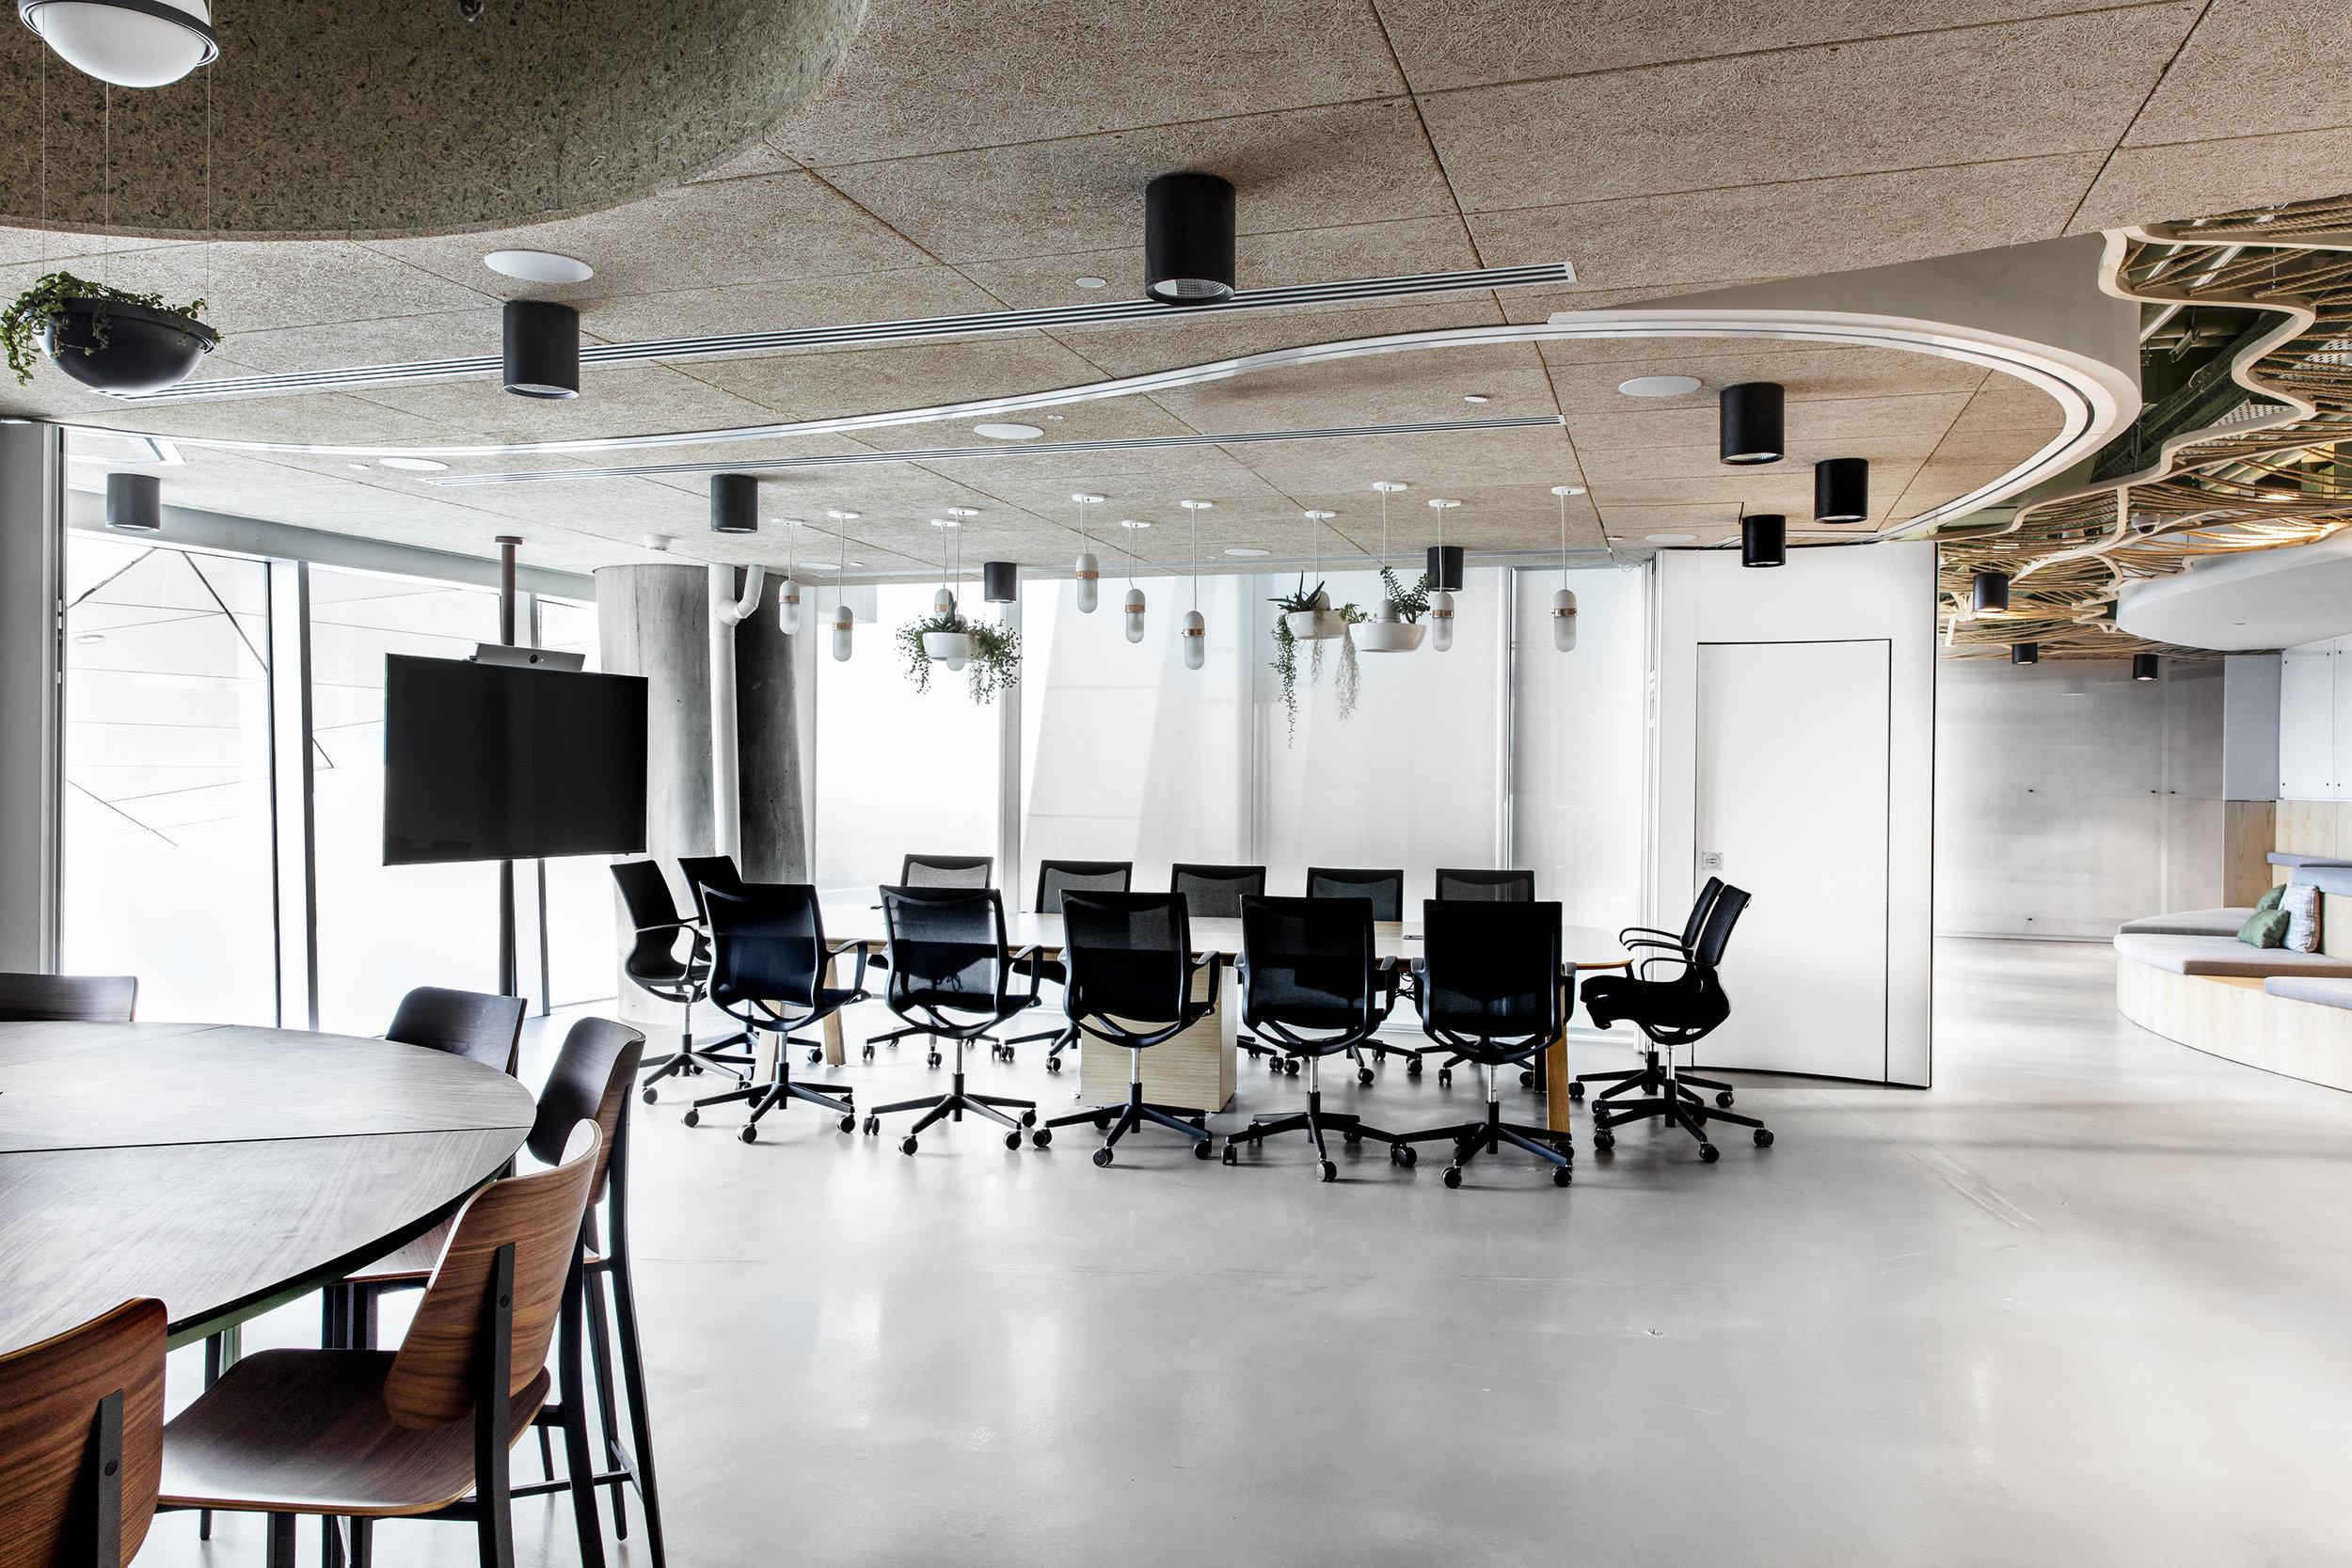 HINNOMAN - ROY DAVID ARCHTECTURE - STUDIO - סטודיו רואי דוד - אדריכלים (40).jpg